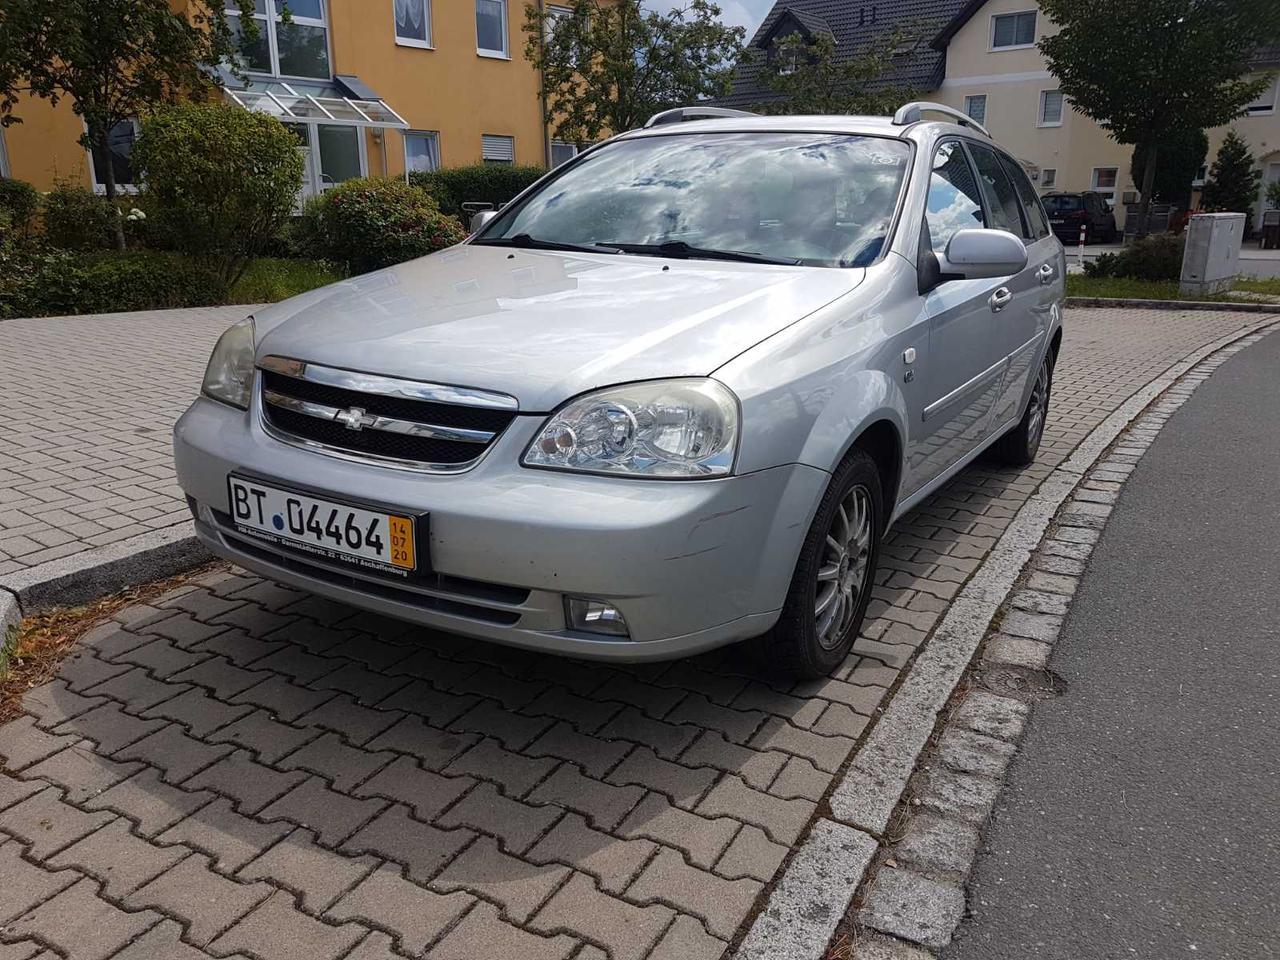 Chevrolet Lacetti Лачетти CDX 1,8 2005г.в. Универсал из Германии